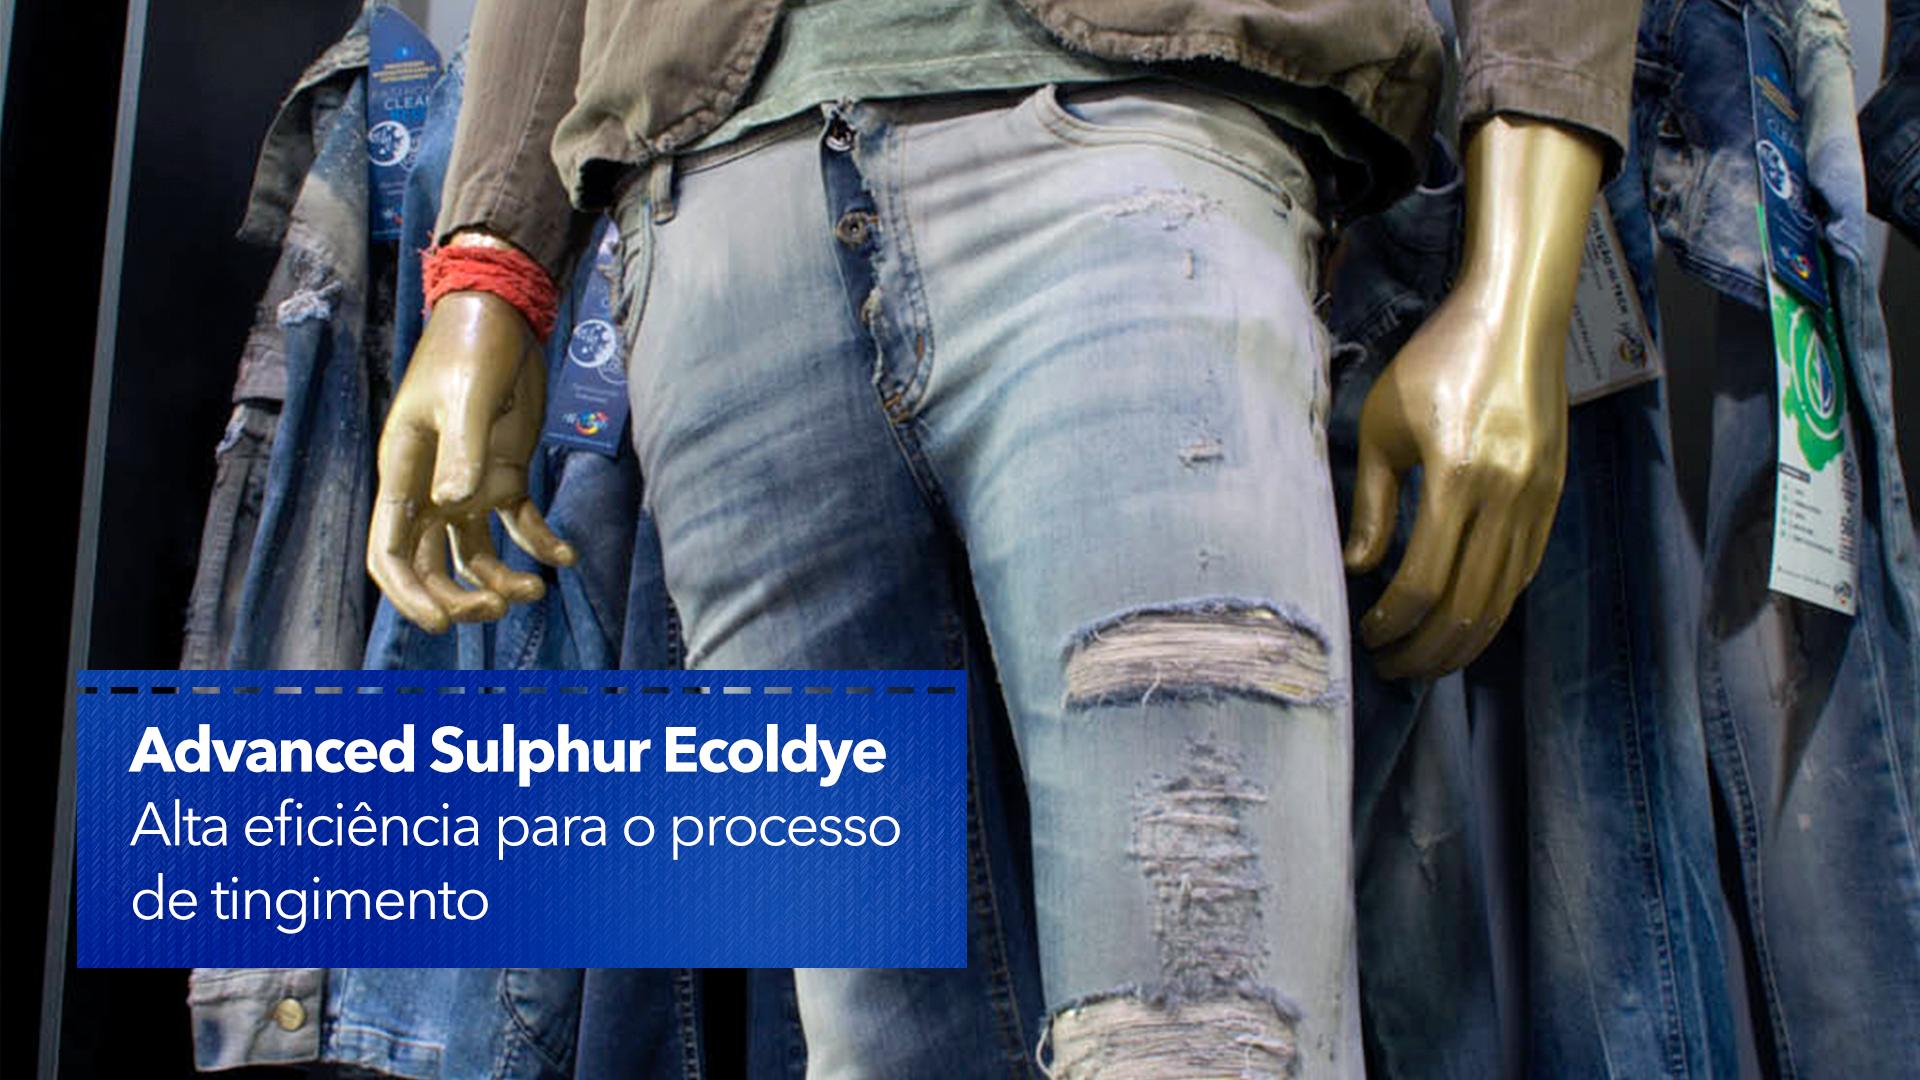 Advanced Sulphur Ecoldye